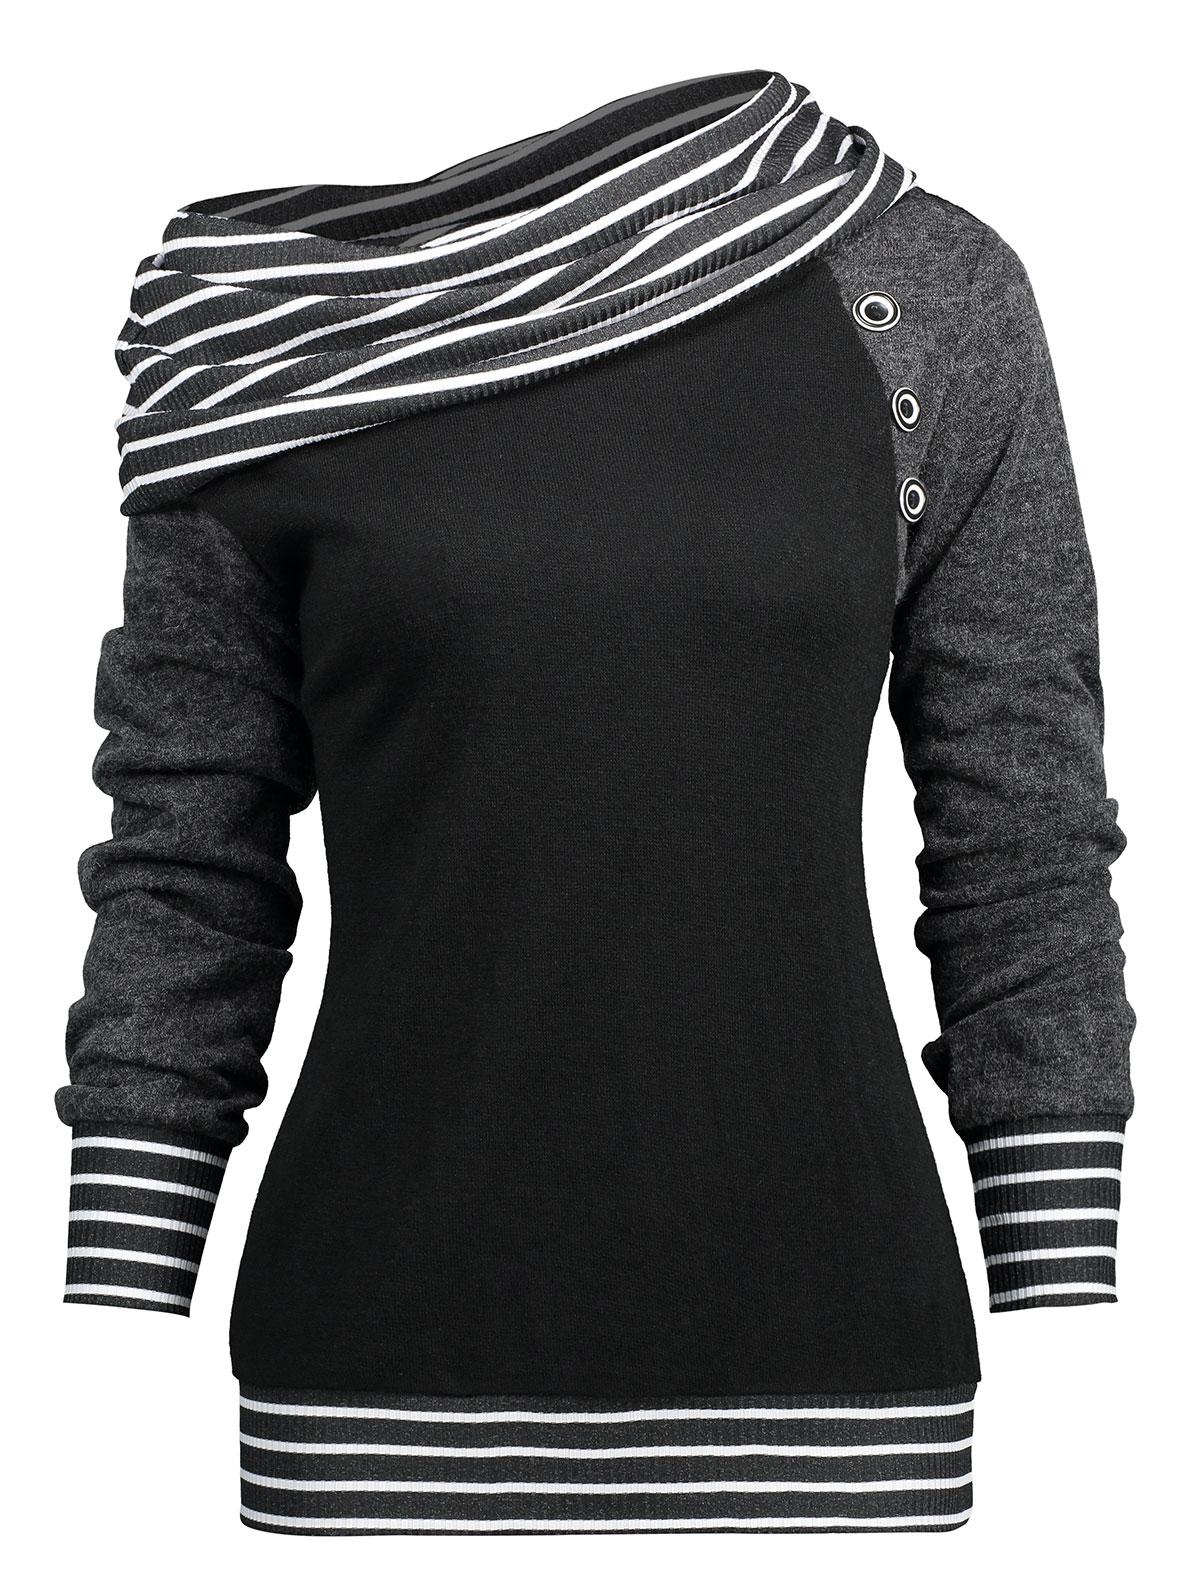 Gamiss T Shirt Women Stripe Trim Skew Neck Raglan Long Sleeve T Shirts Autumn Spring Womens Tops Tees Shirt Casual T Shirts Tees